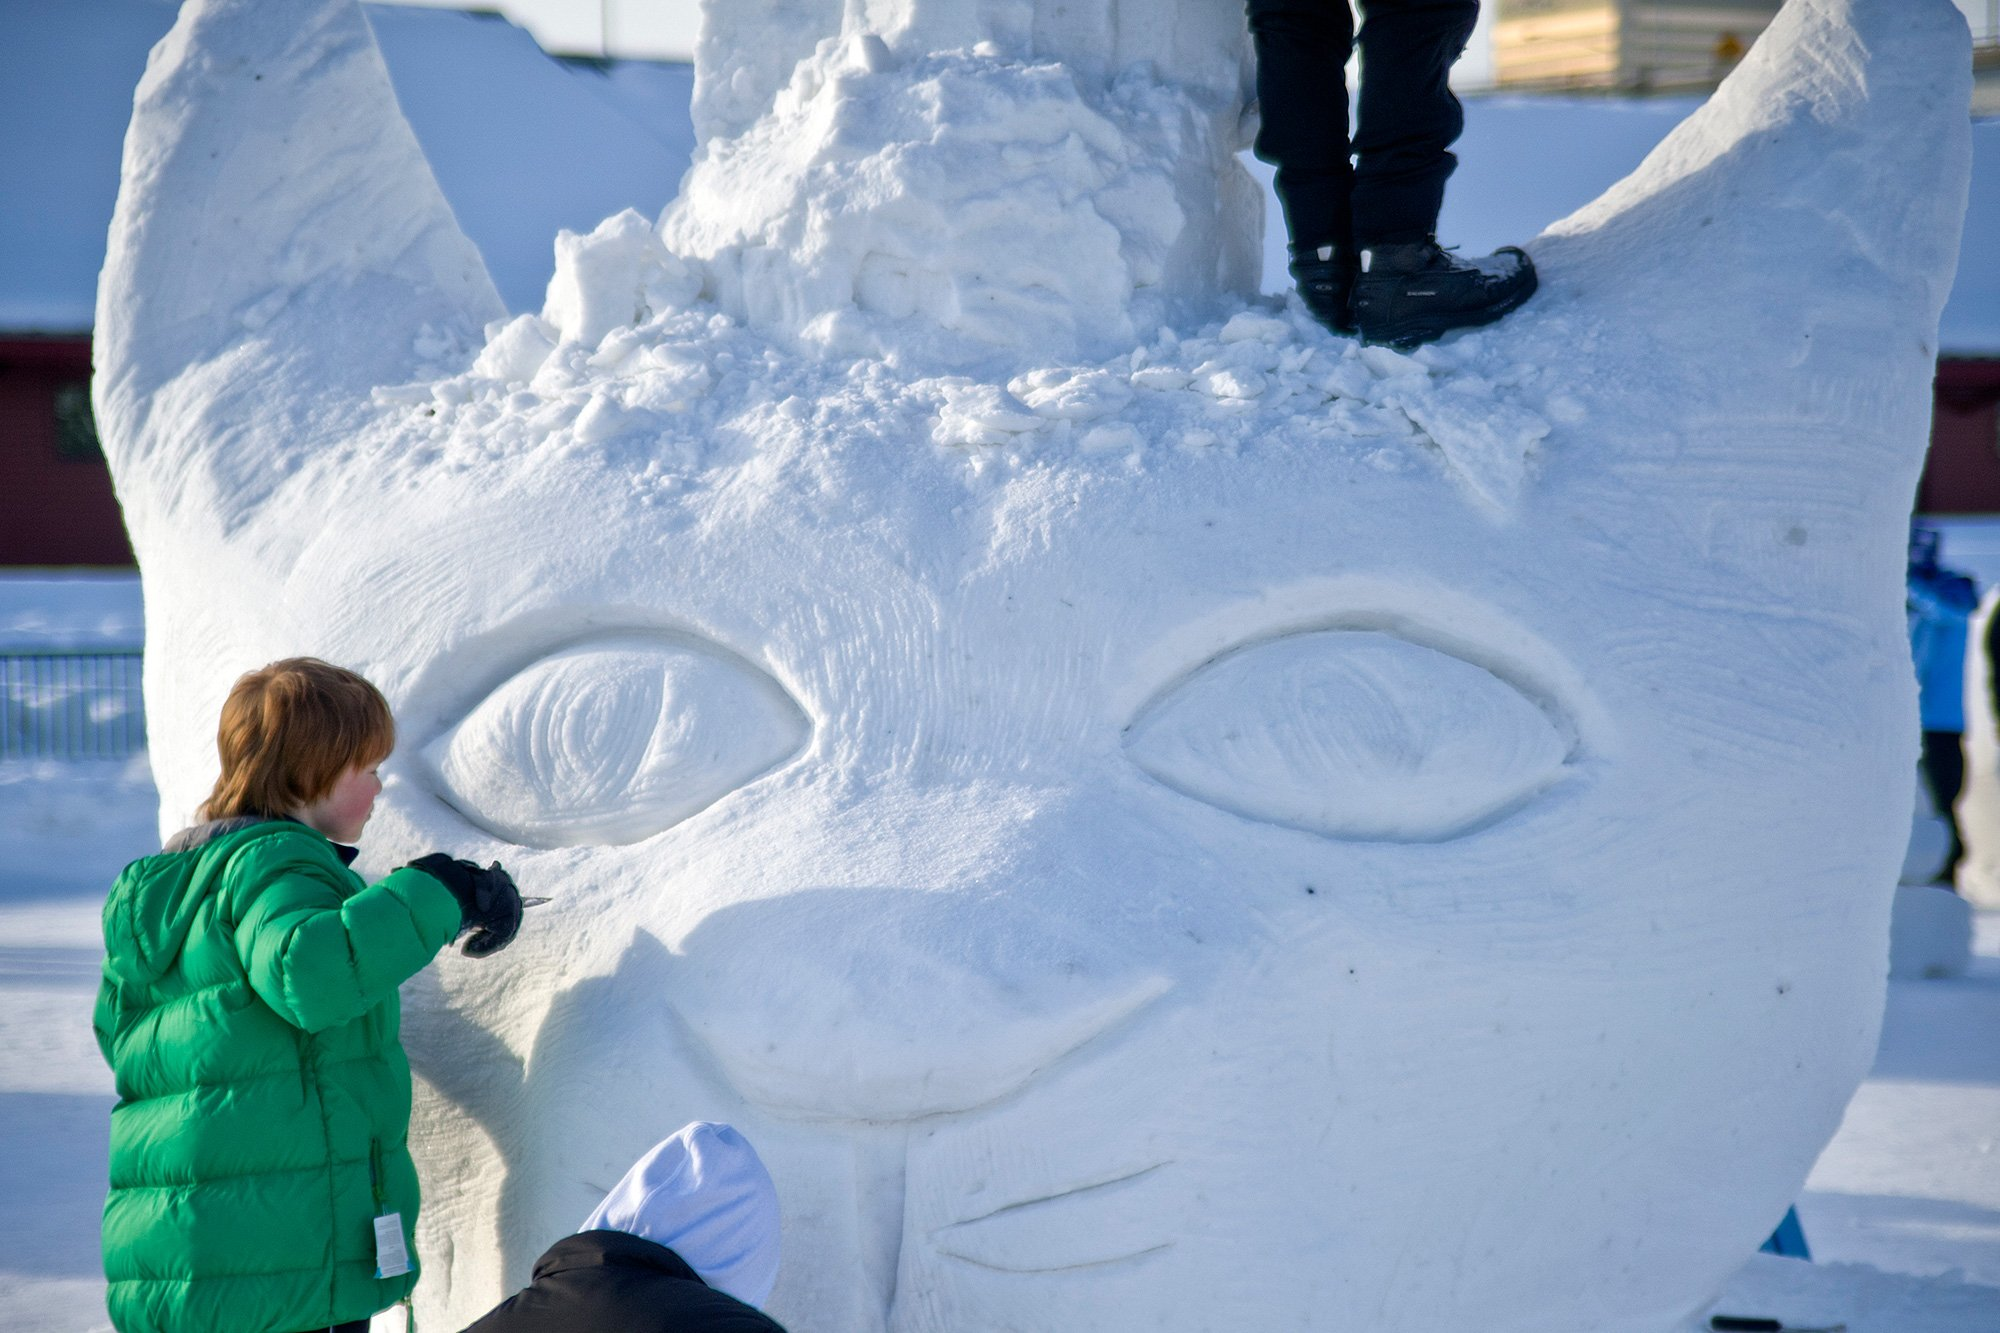 child carving snow sculpture